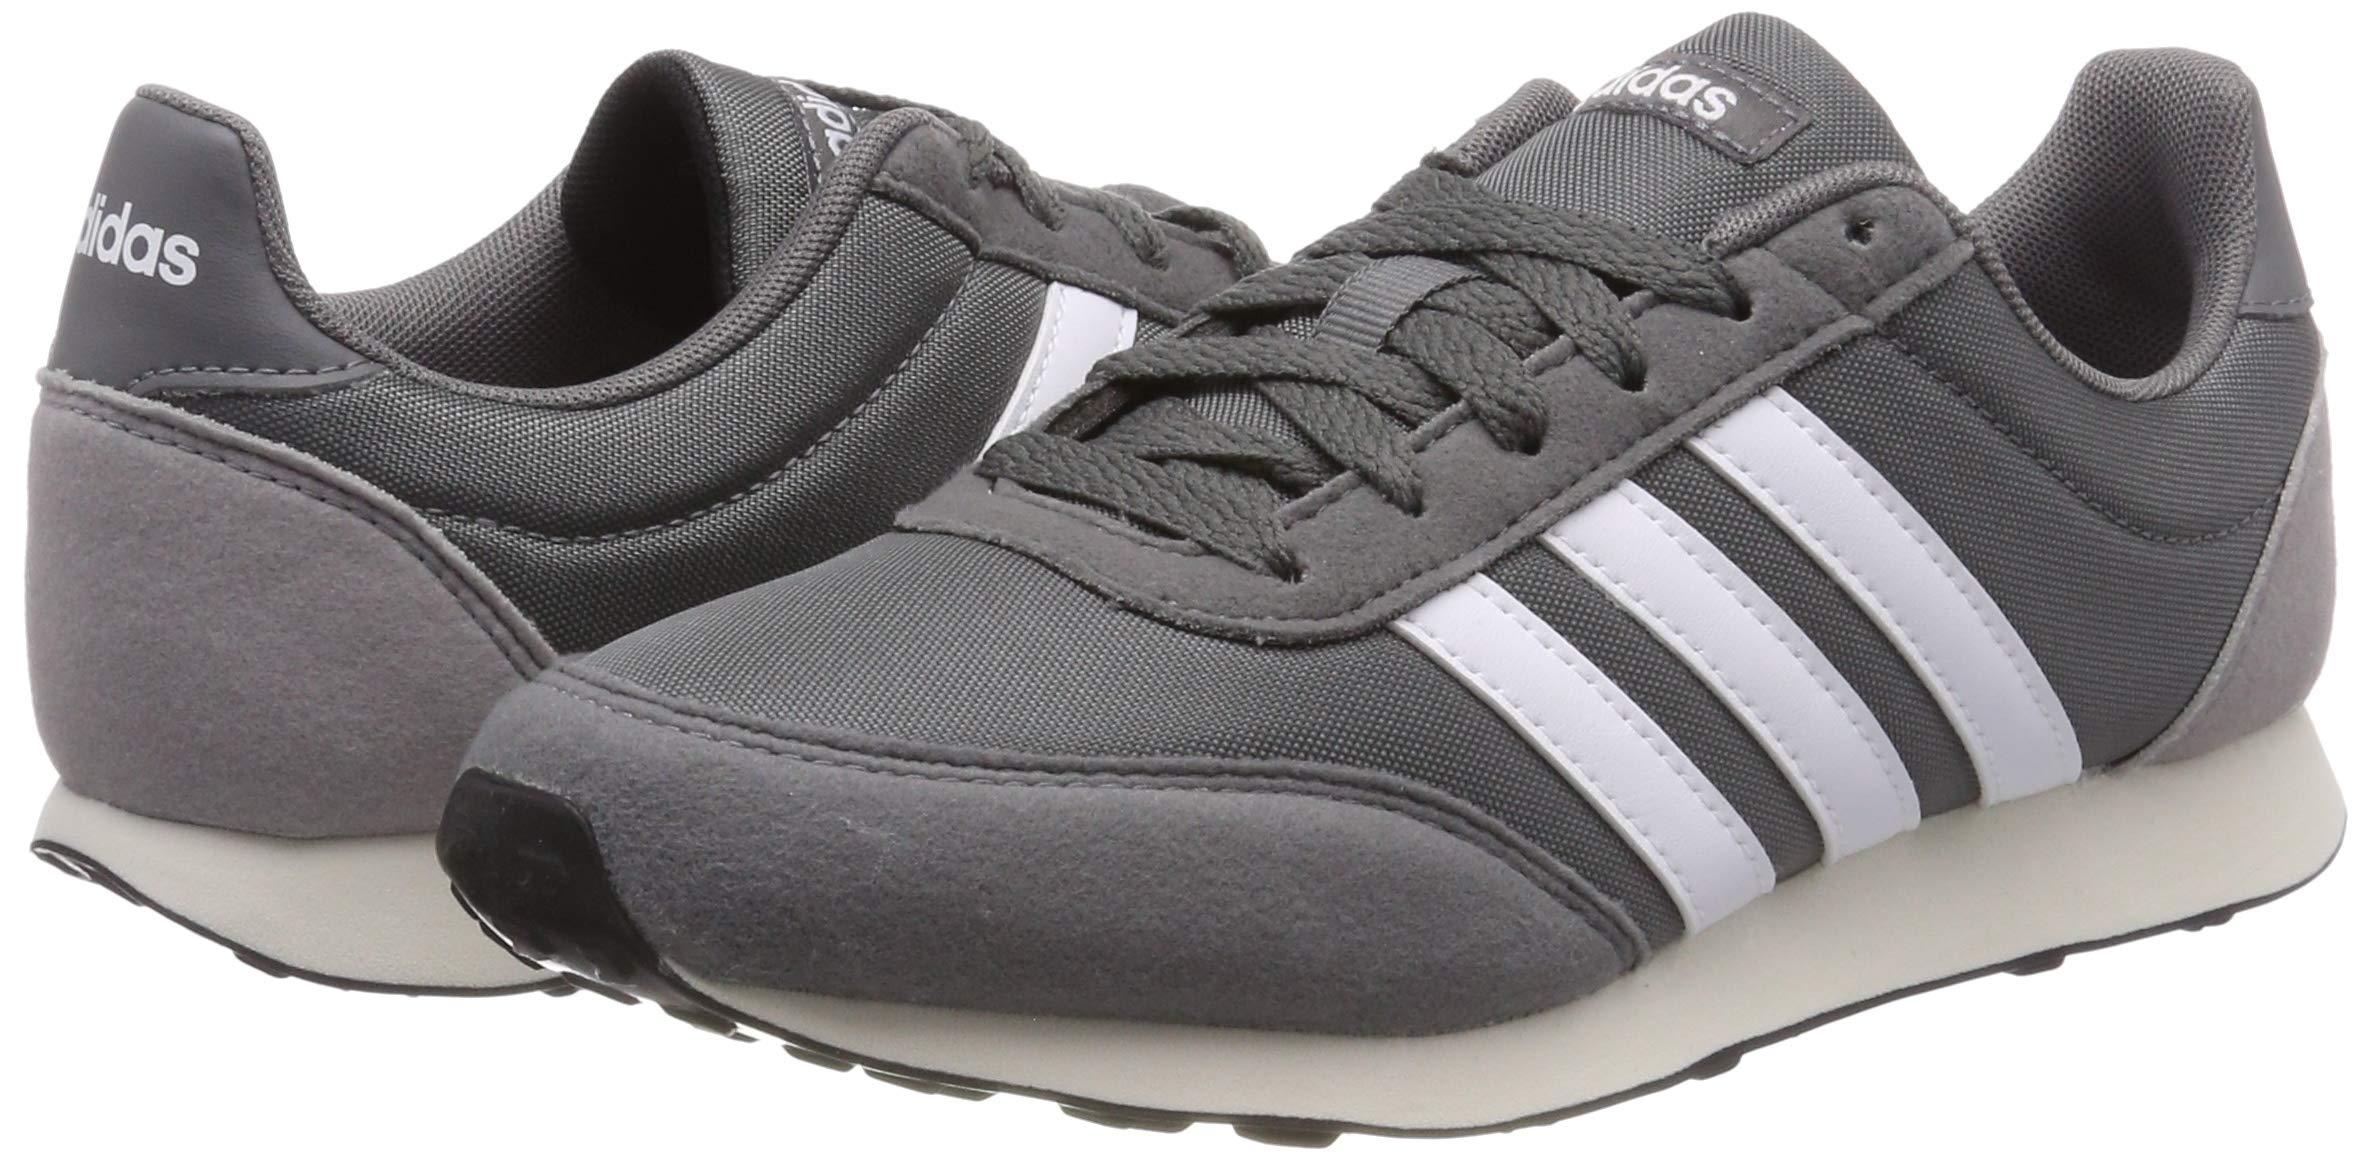 adidas Men's V Racer 2.0 Running Shoes